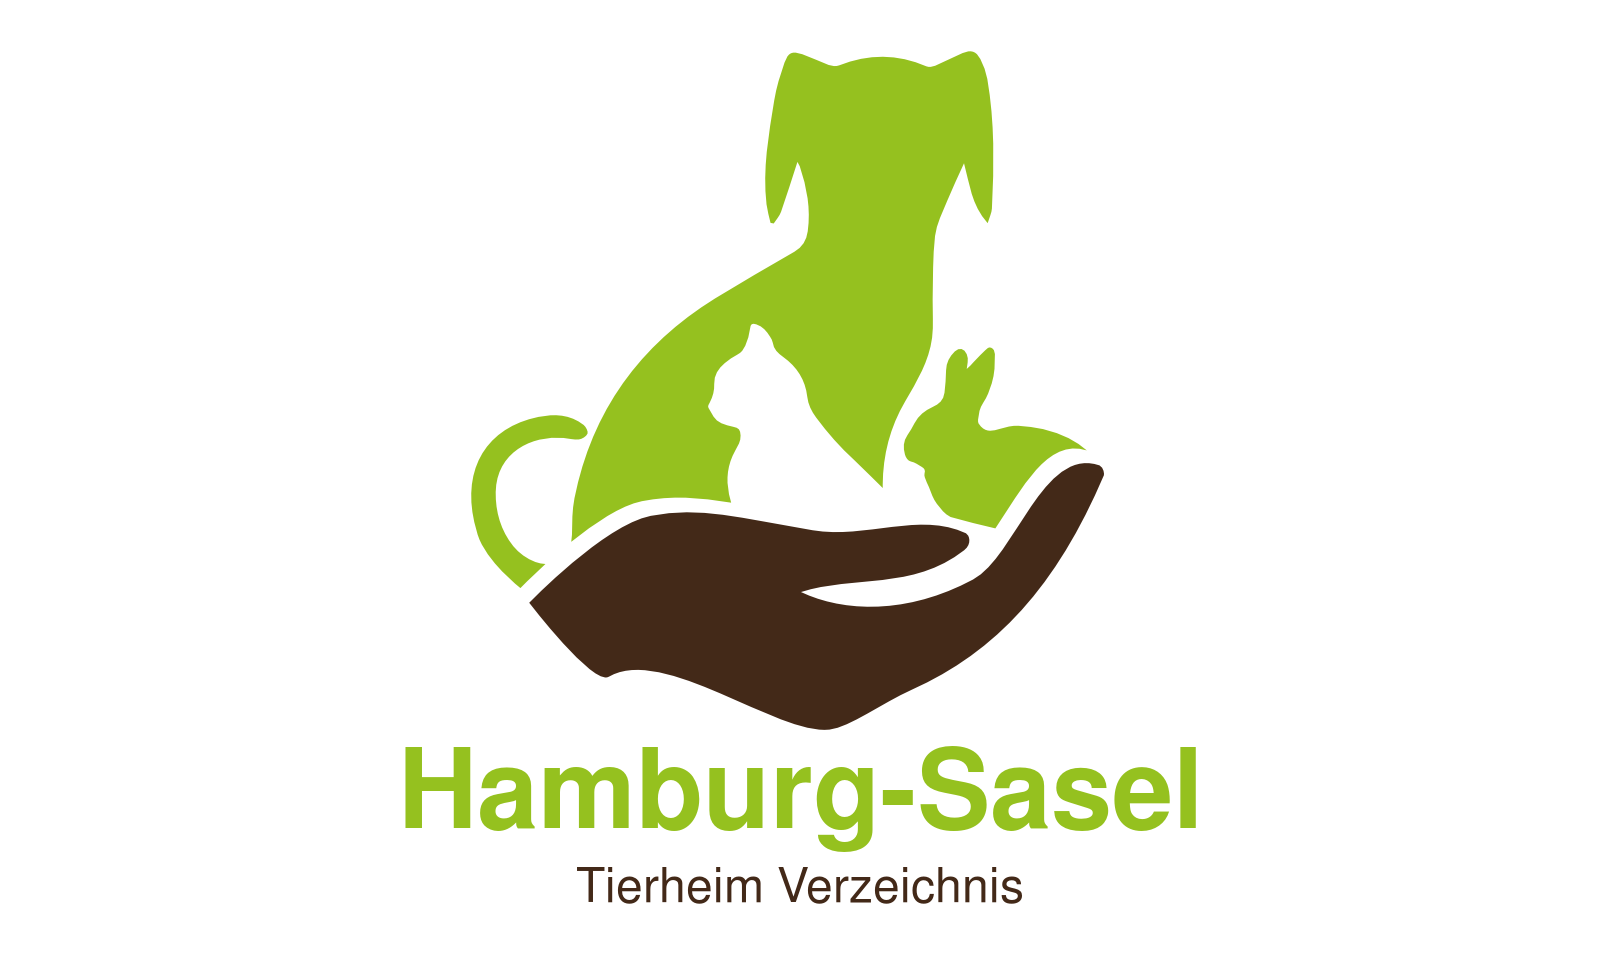 Tierheim Hamburg Sasel